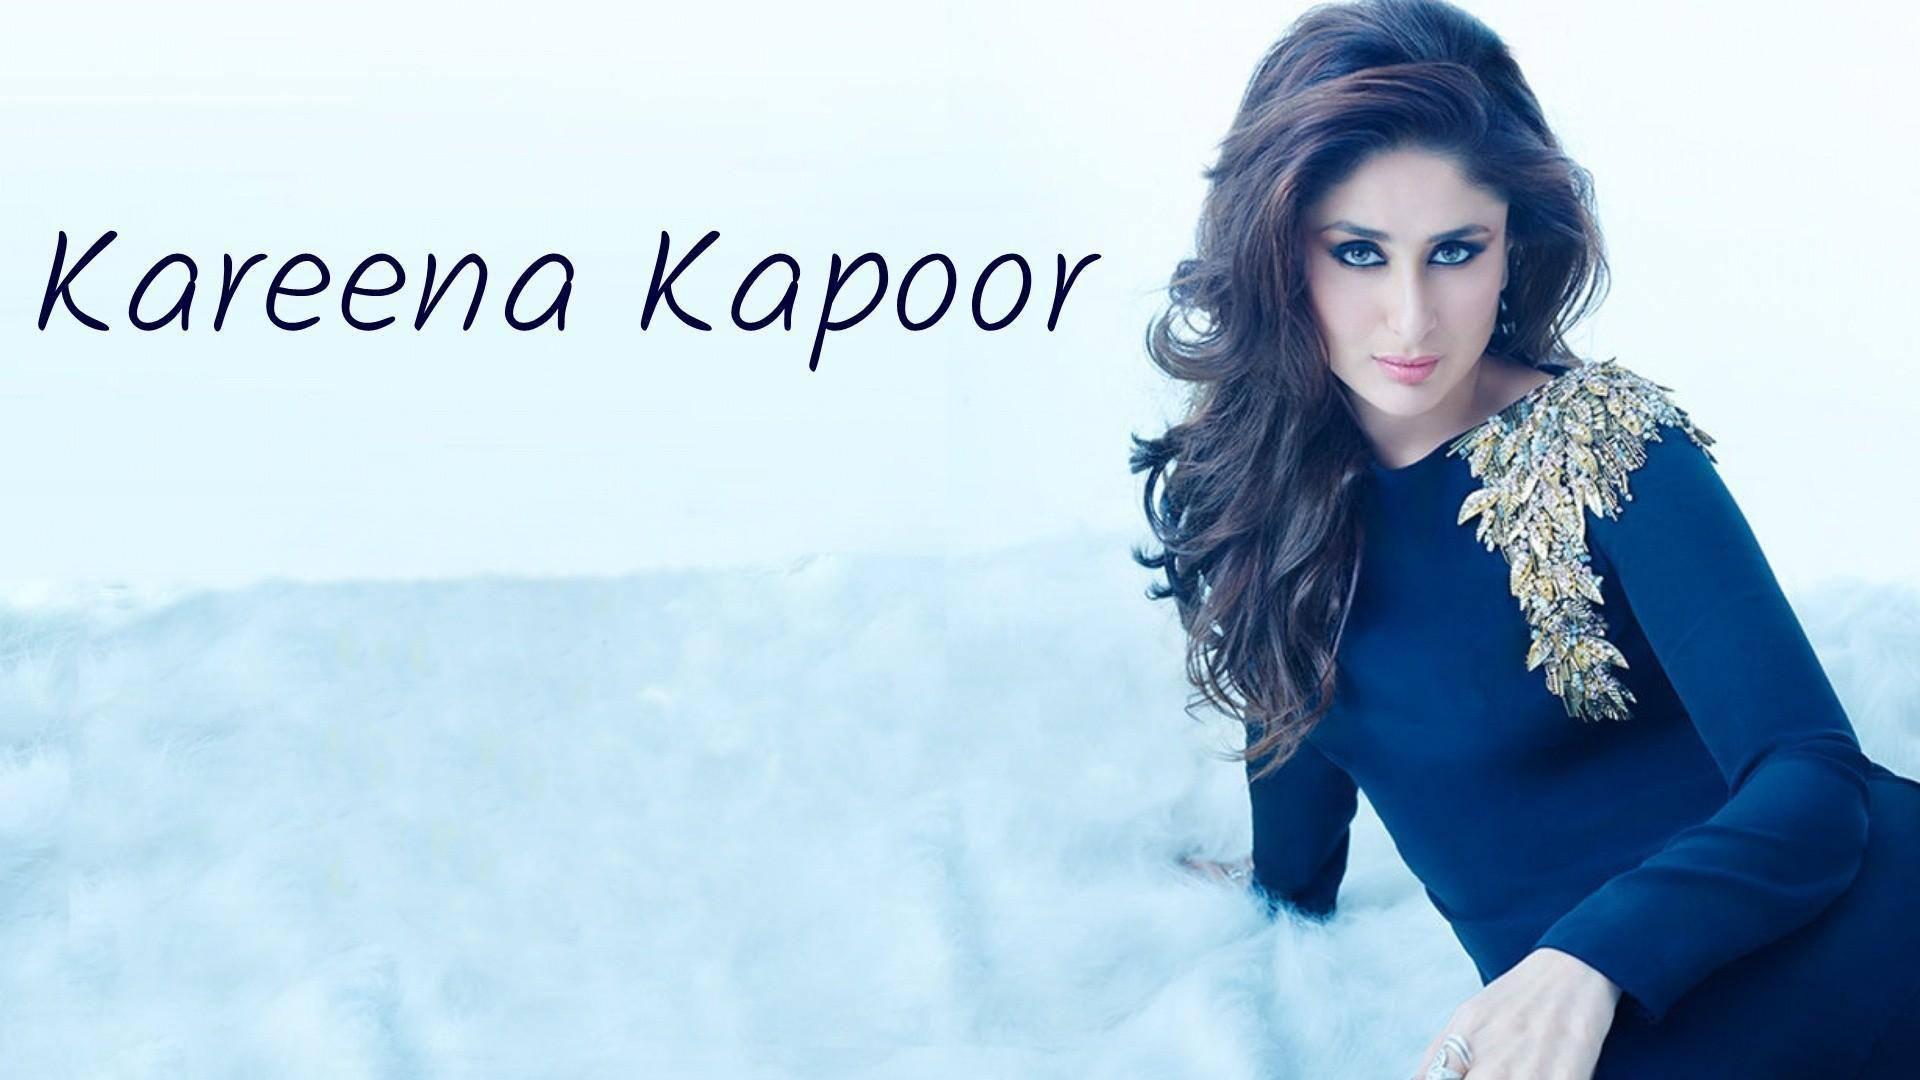 kareena_kapoor_46646047